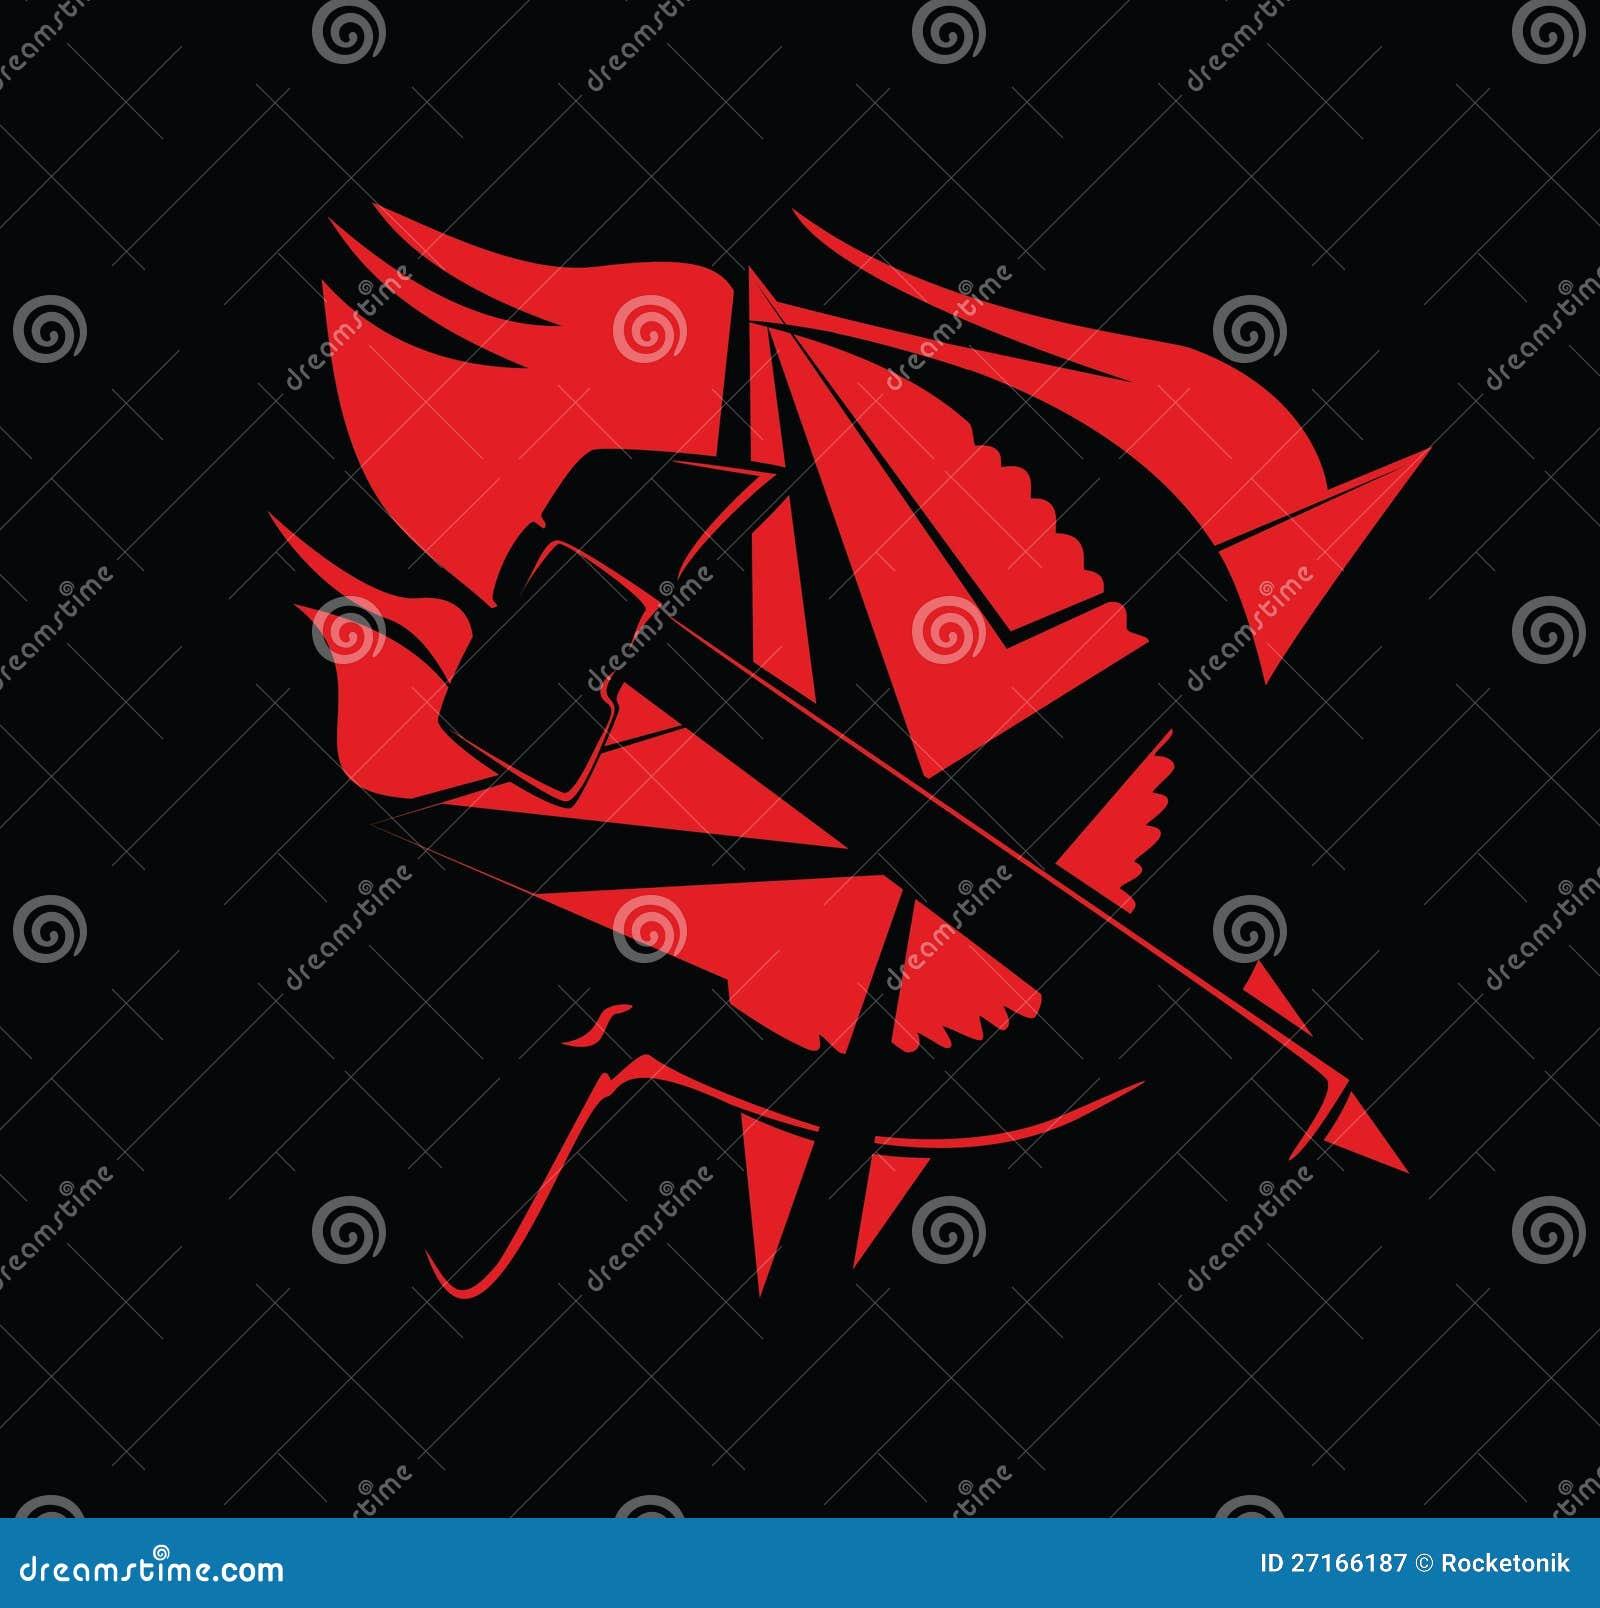 Communist Symbol Star Communism Symbol Red on